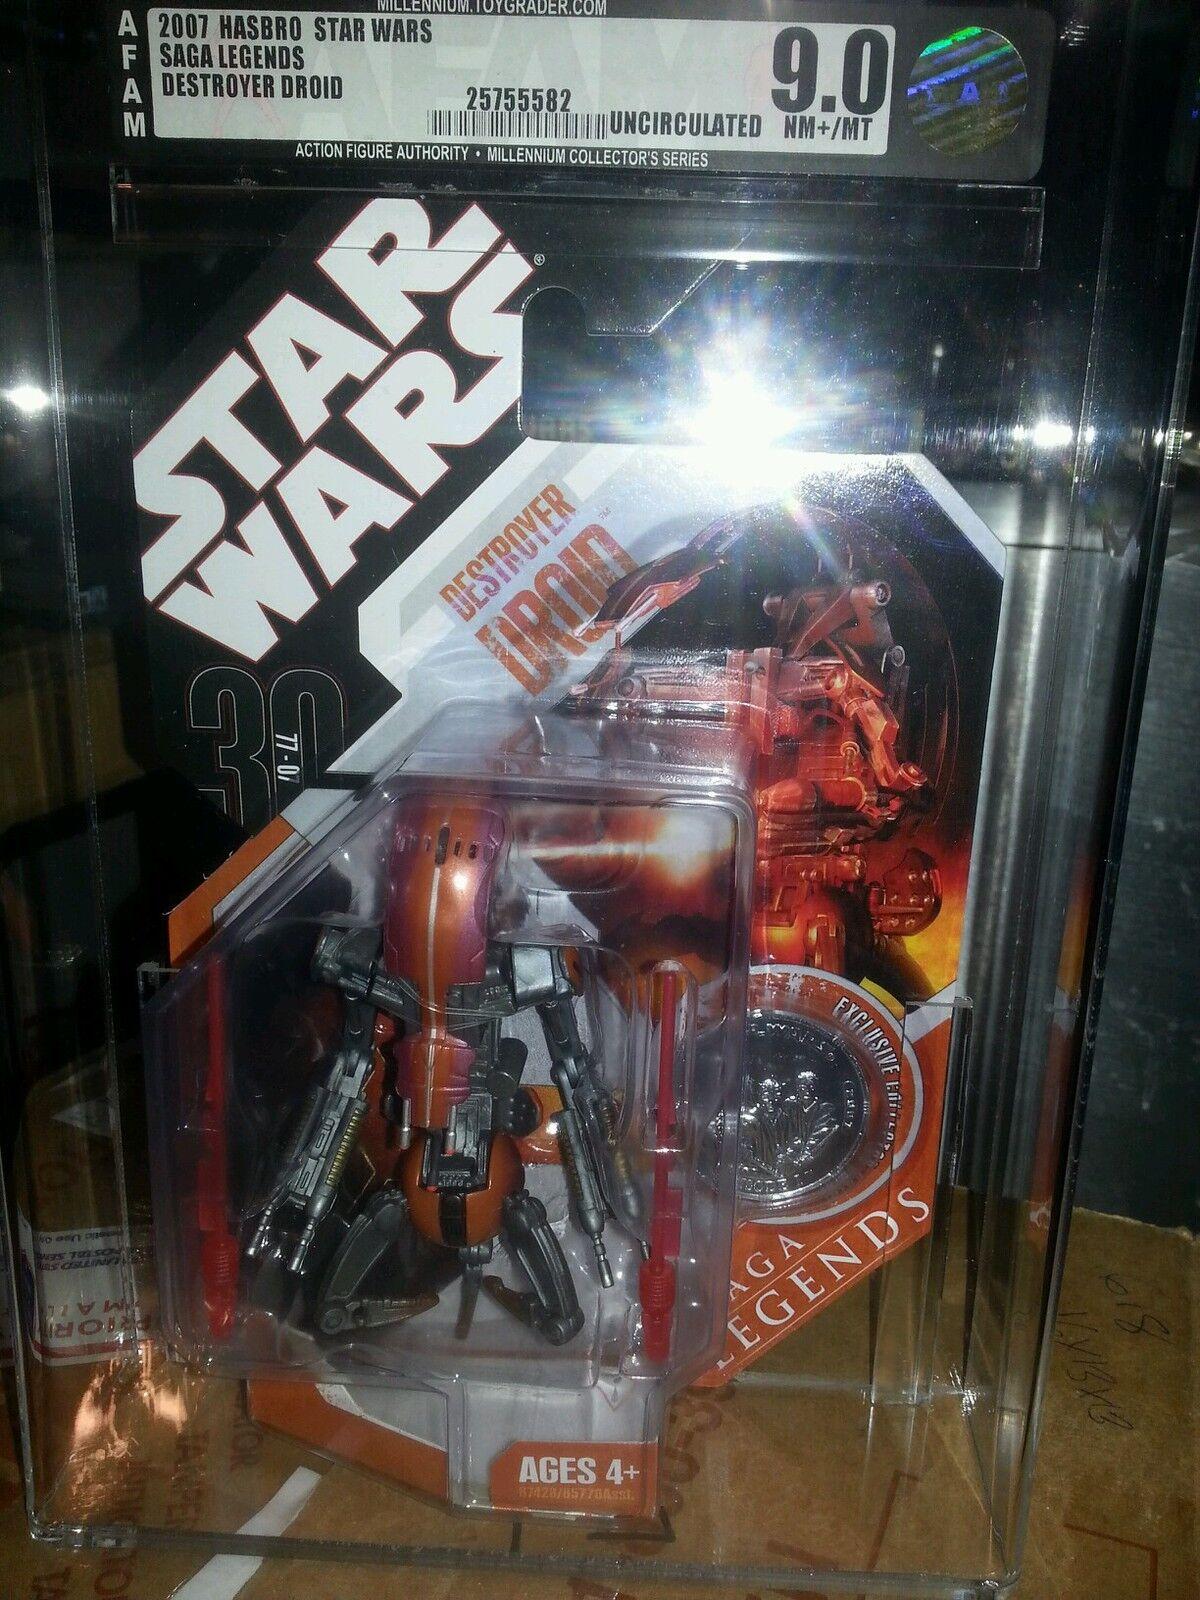 Star Star Star wars Destroyer Droid Saga Legends tac AFA 9.0 uncirculated ff8282